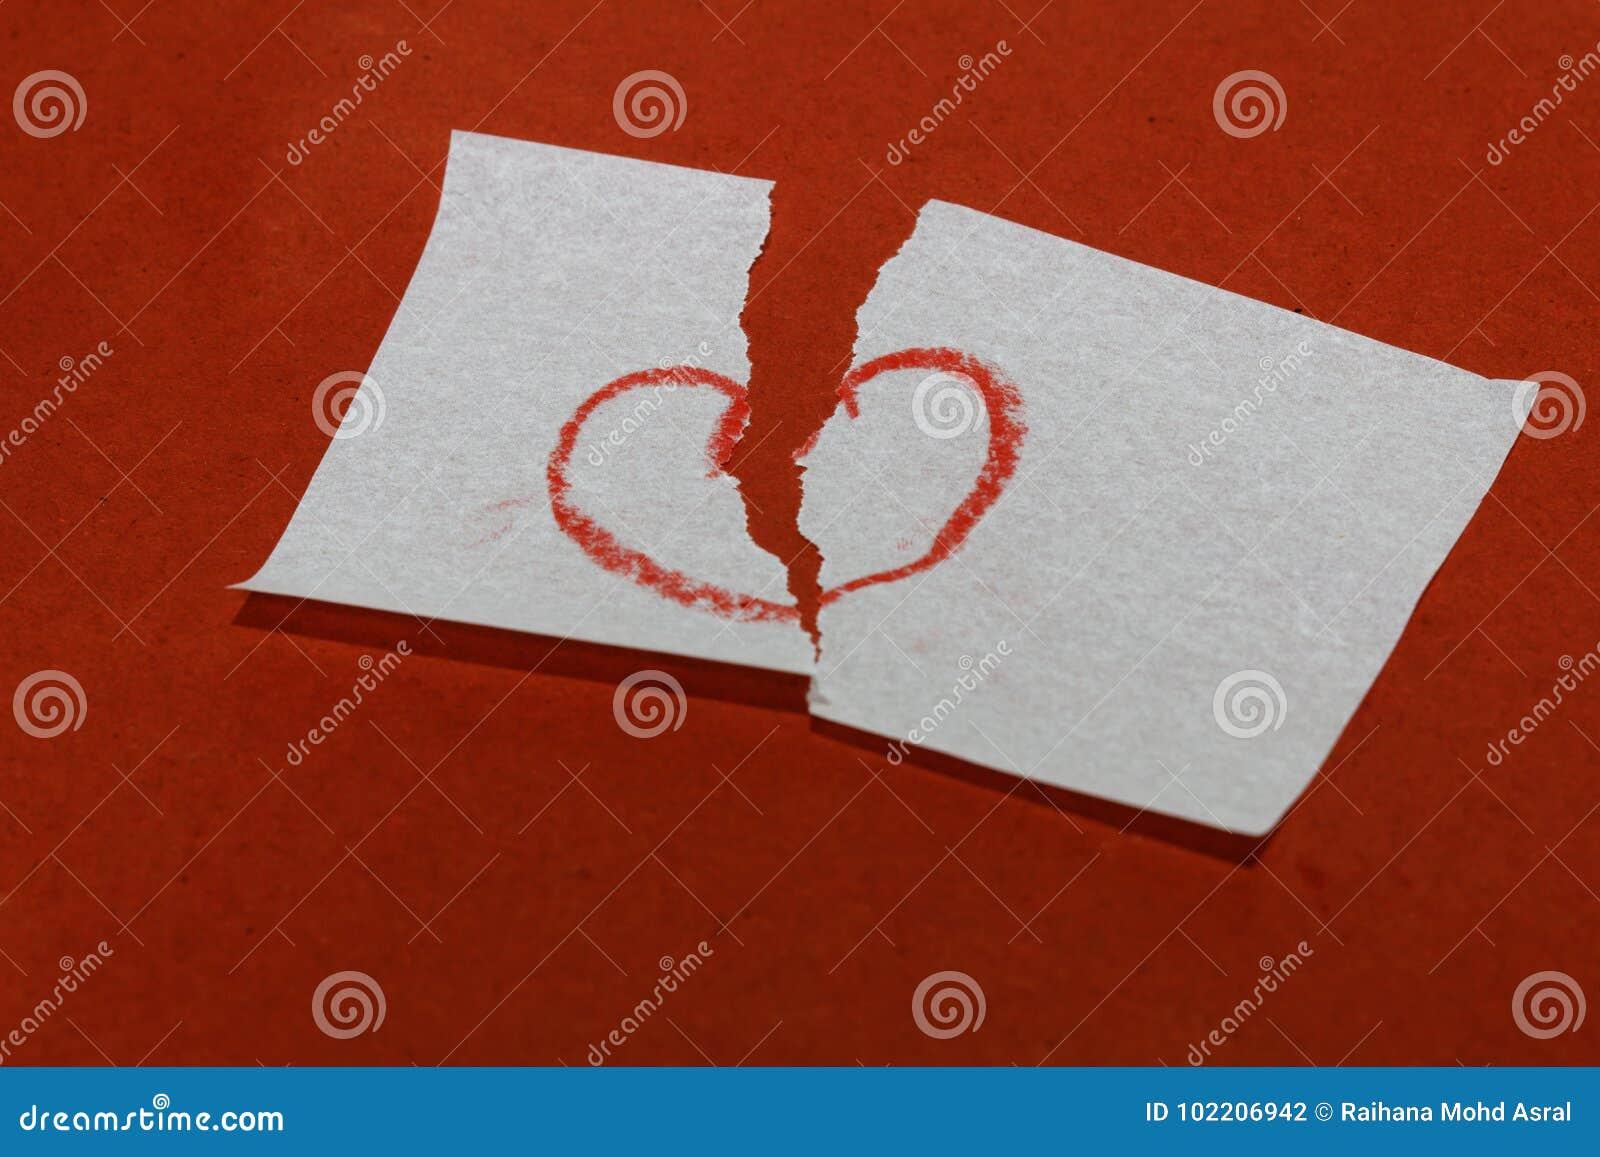 Heart Break Broken Heart Symbol On Red Background Stock Photo